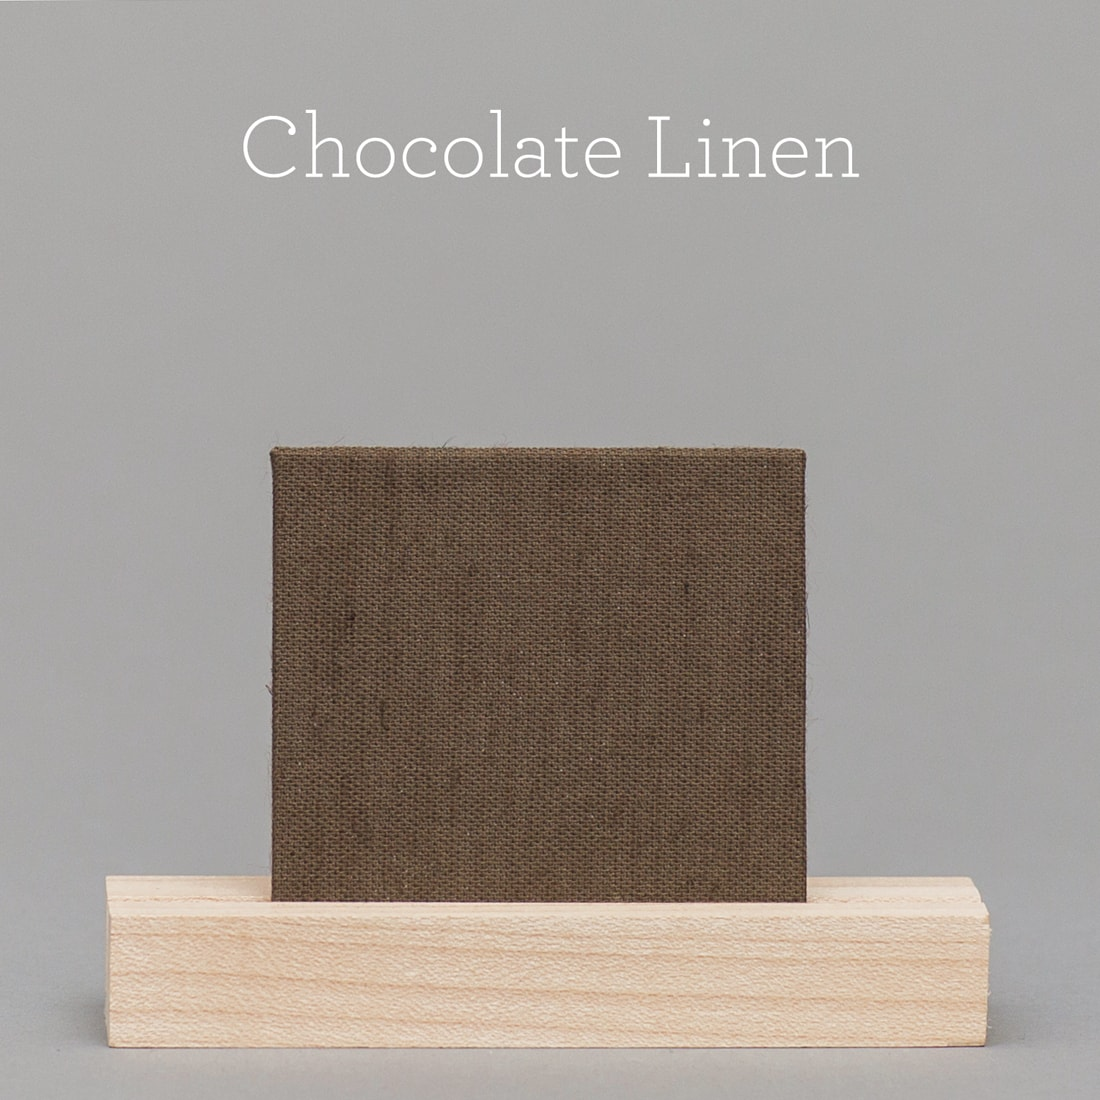 ChocolateLinen